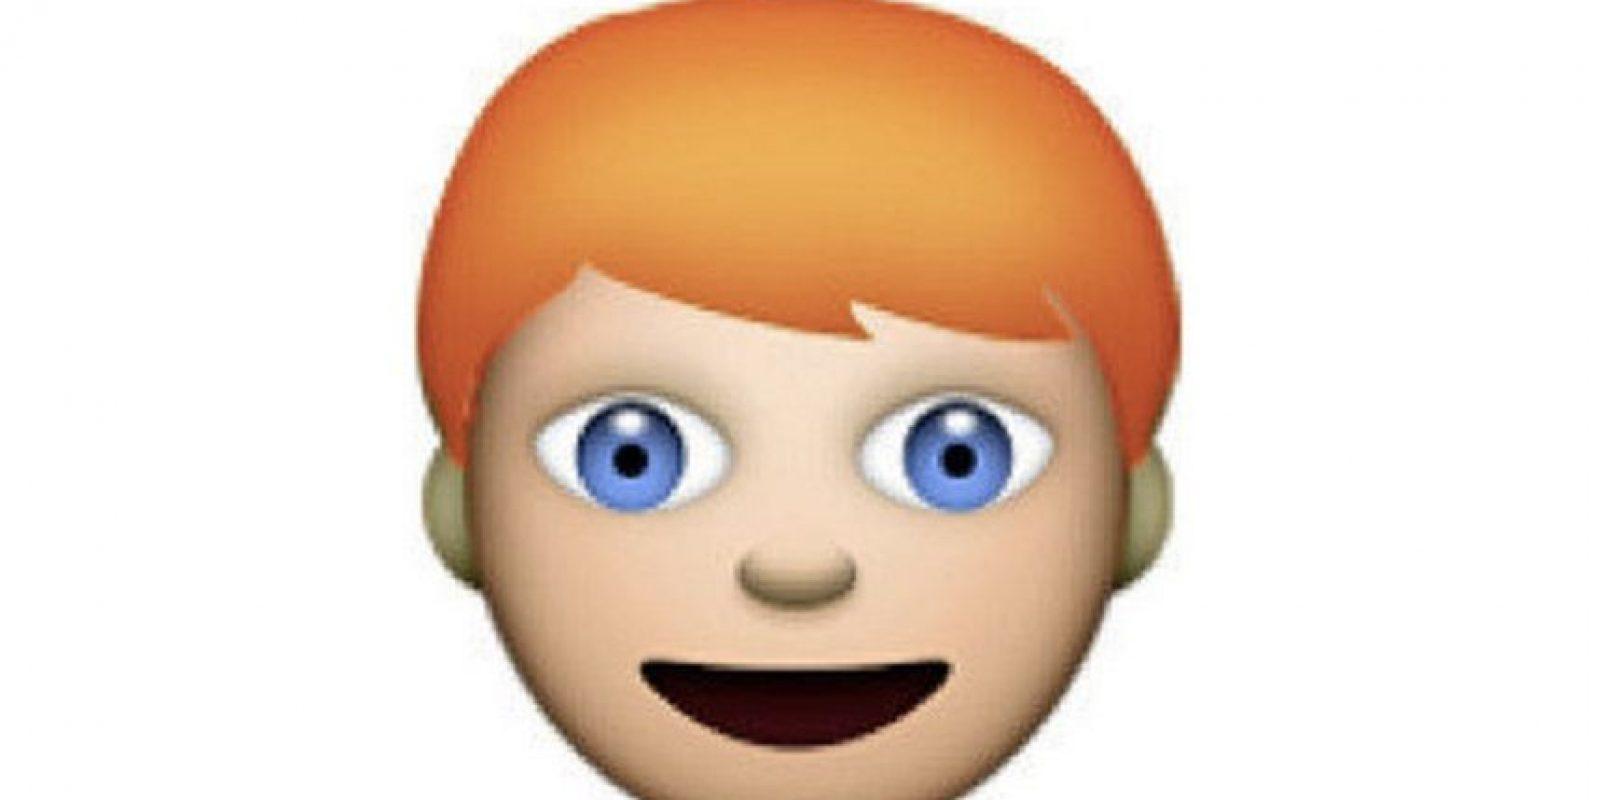 Escocia desea emojis pelirrojos. Foto:gingerparrot.co.uk